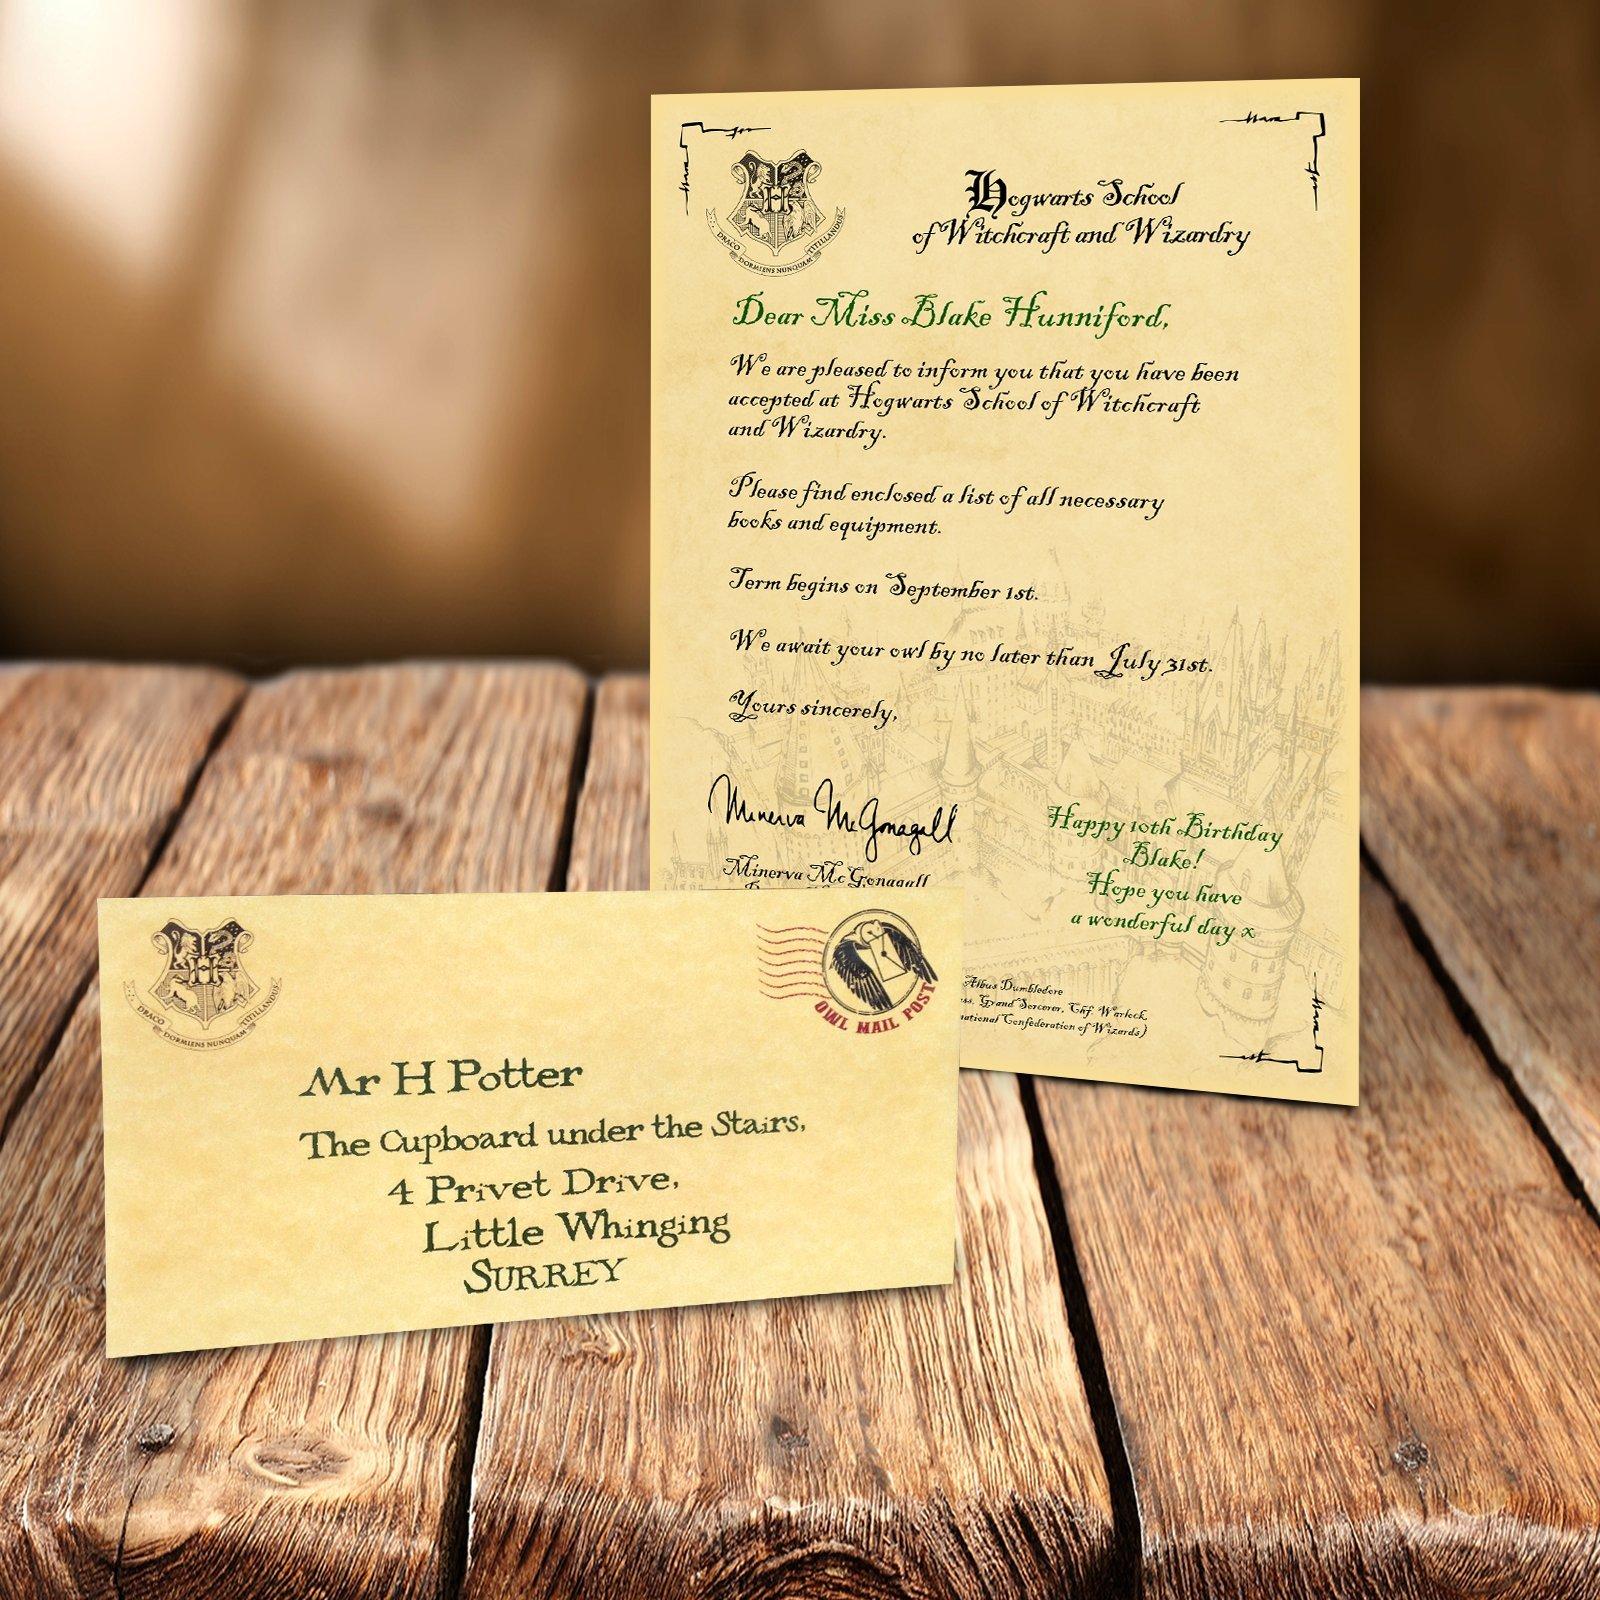 Worlds Afar Personalised Hogwarts Acceptance Letter Envelope Harry Potter Gift Merchandise Gifts For Girls Or Boys Buy Online In United Arab Emirates At Desertcart Productid 47933699